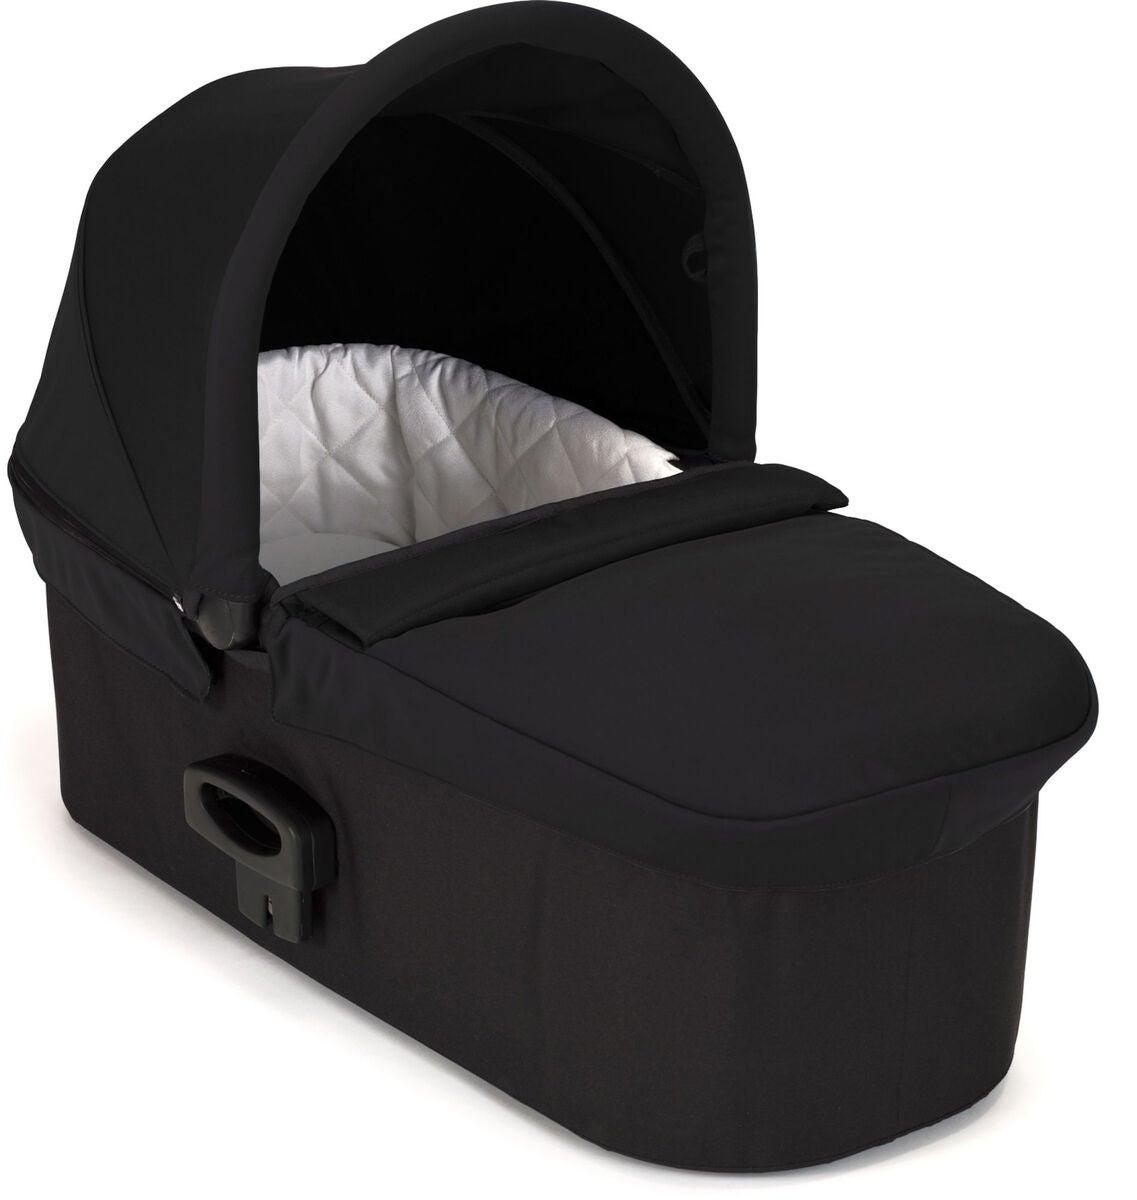 K 246 P Baby Jogger Deluxe Pram Liggdel Black Jollyroom